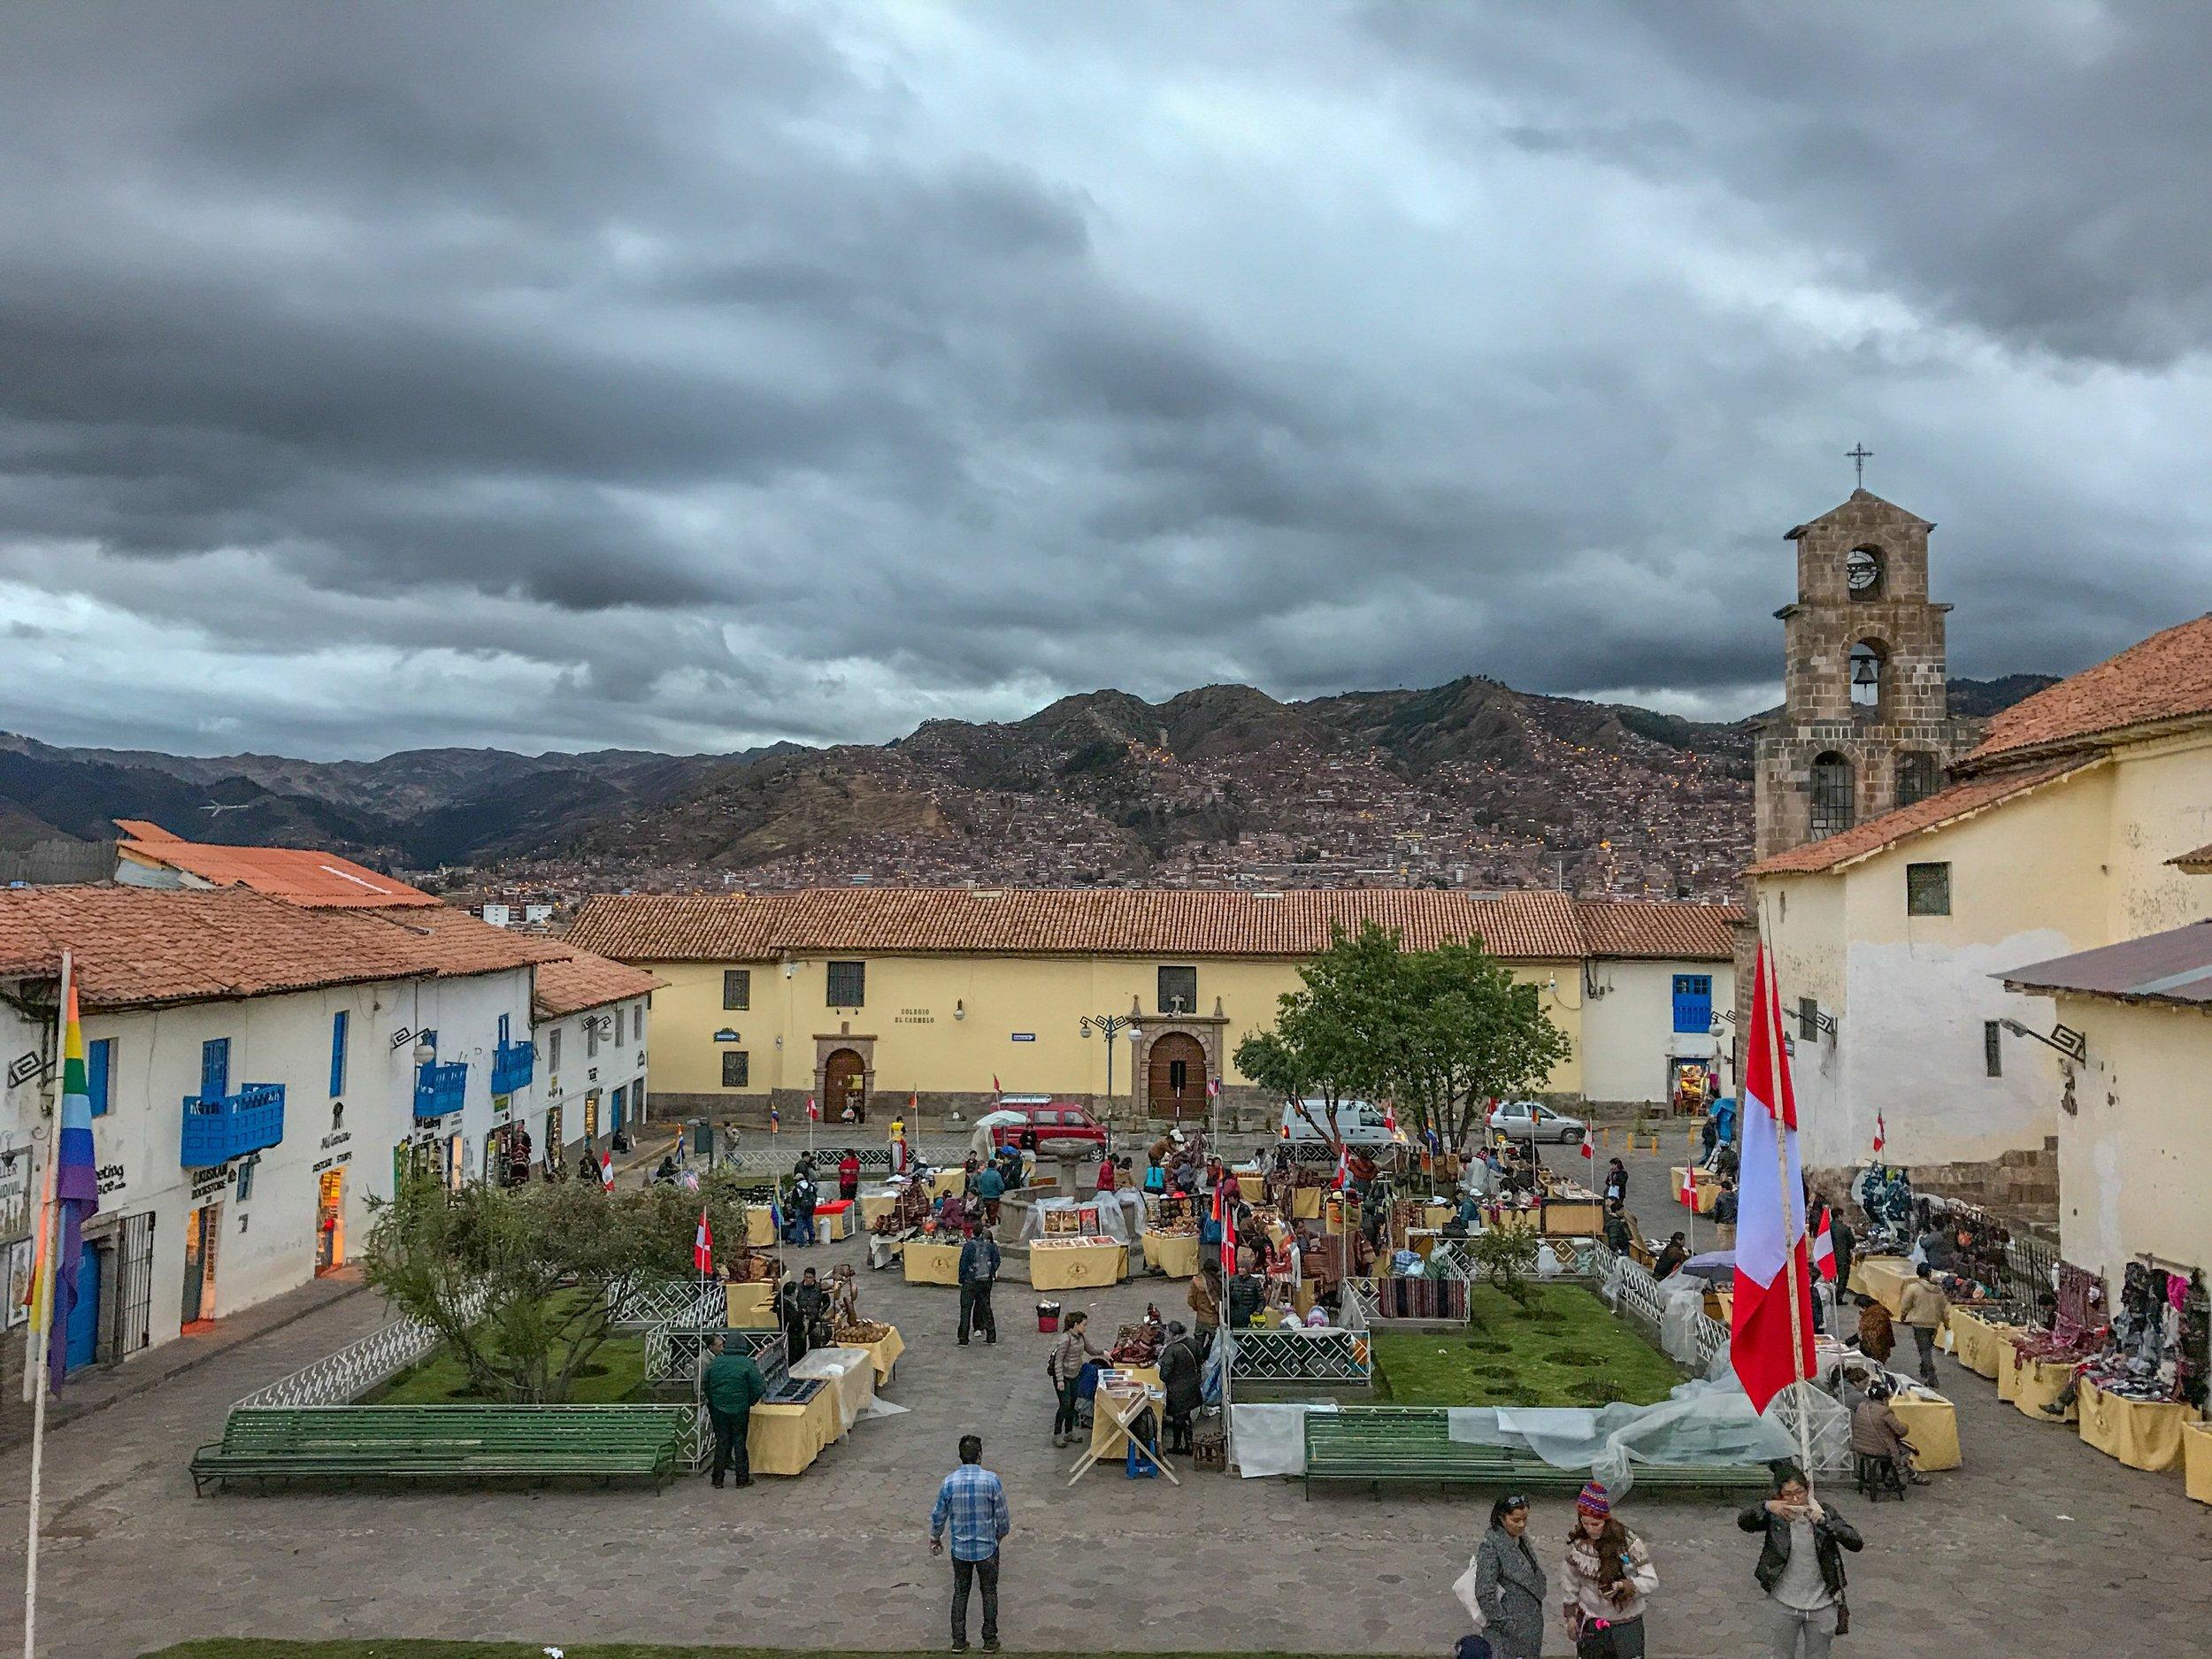 San Blas Plaza in central Cusco